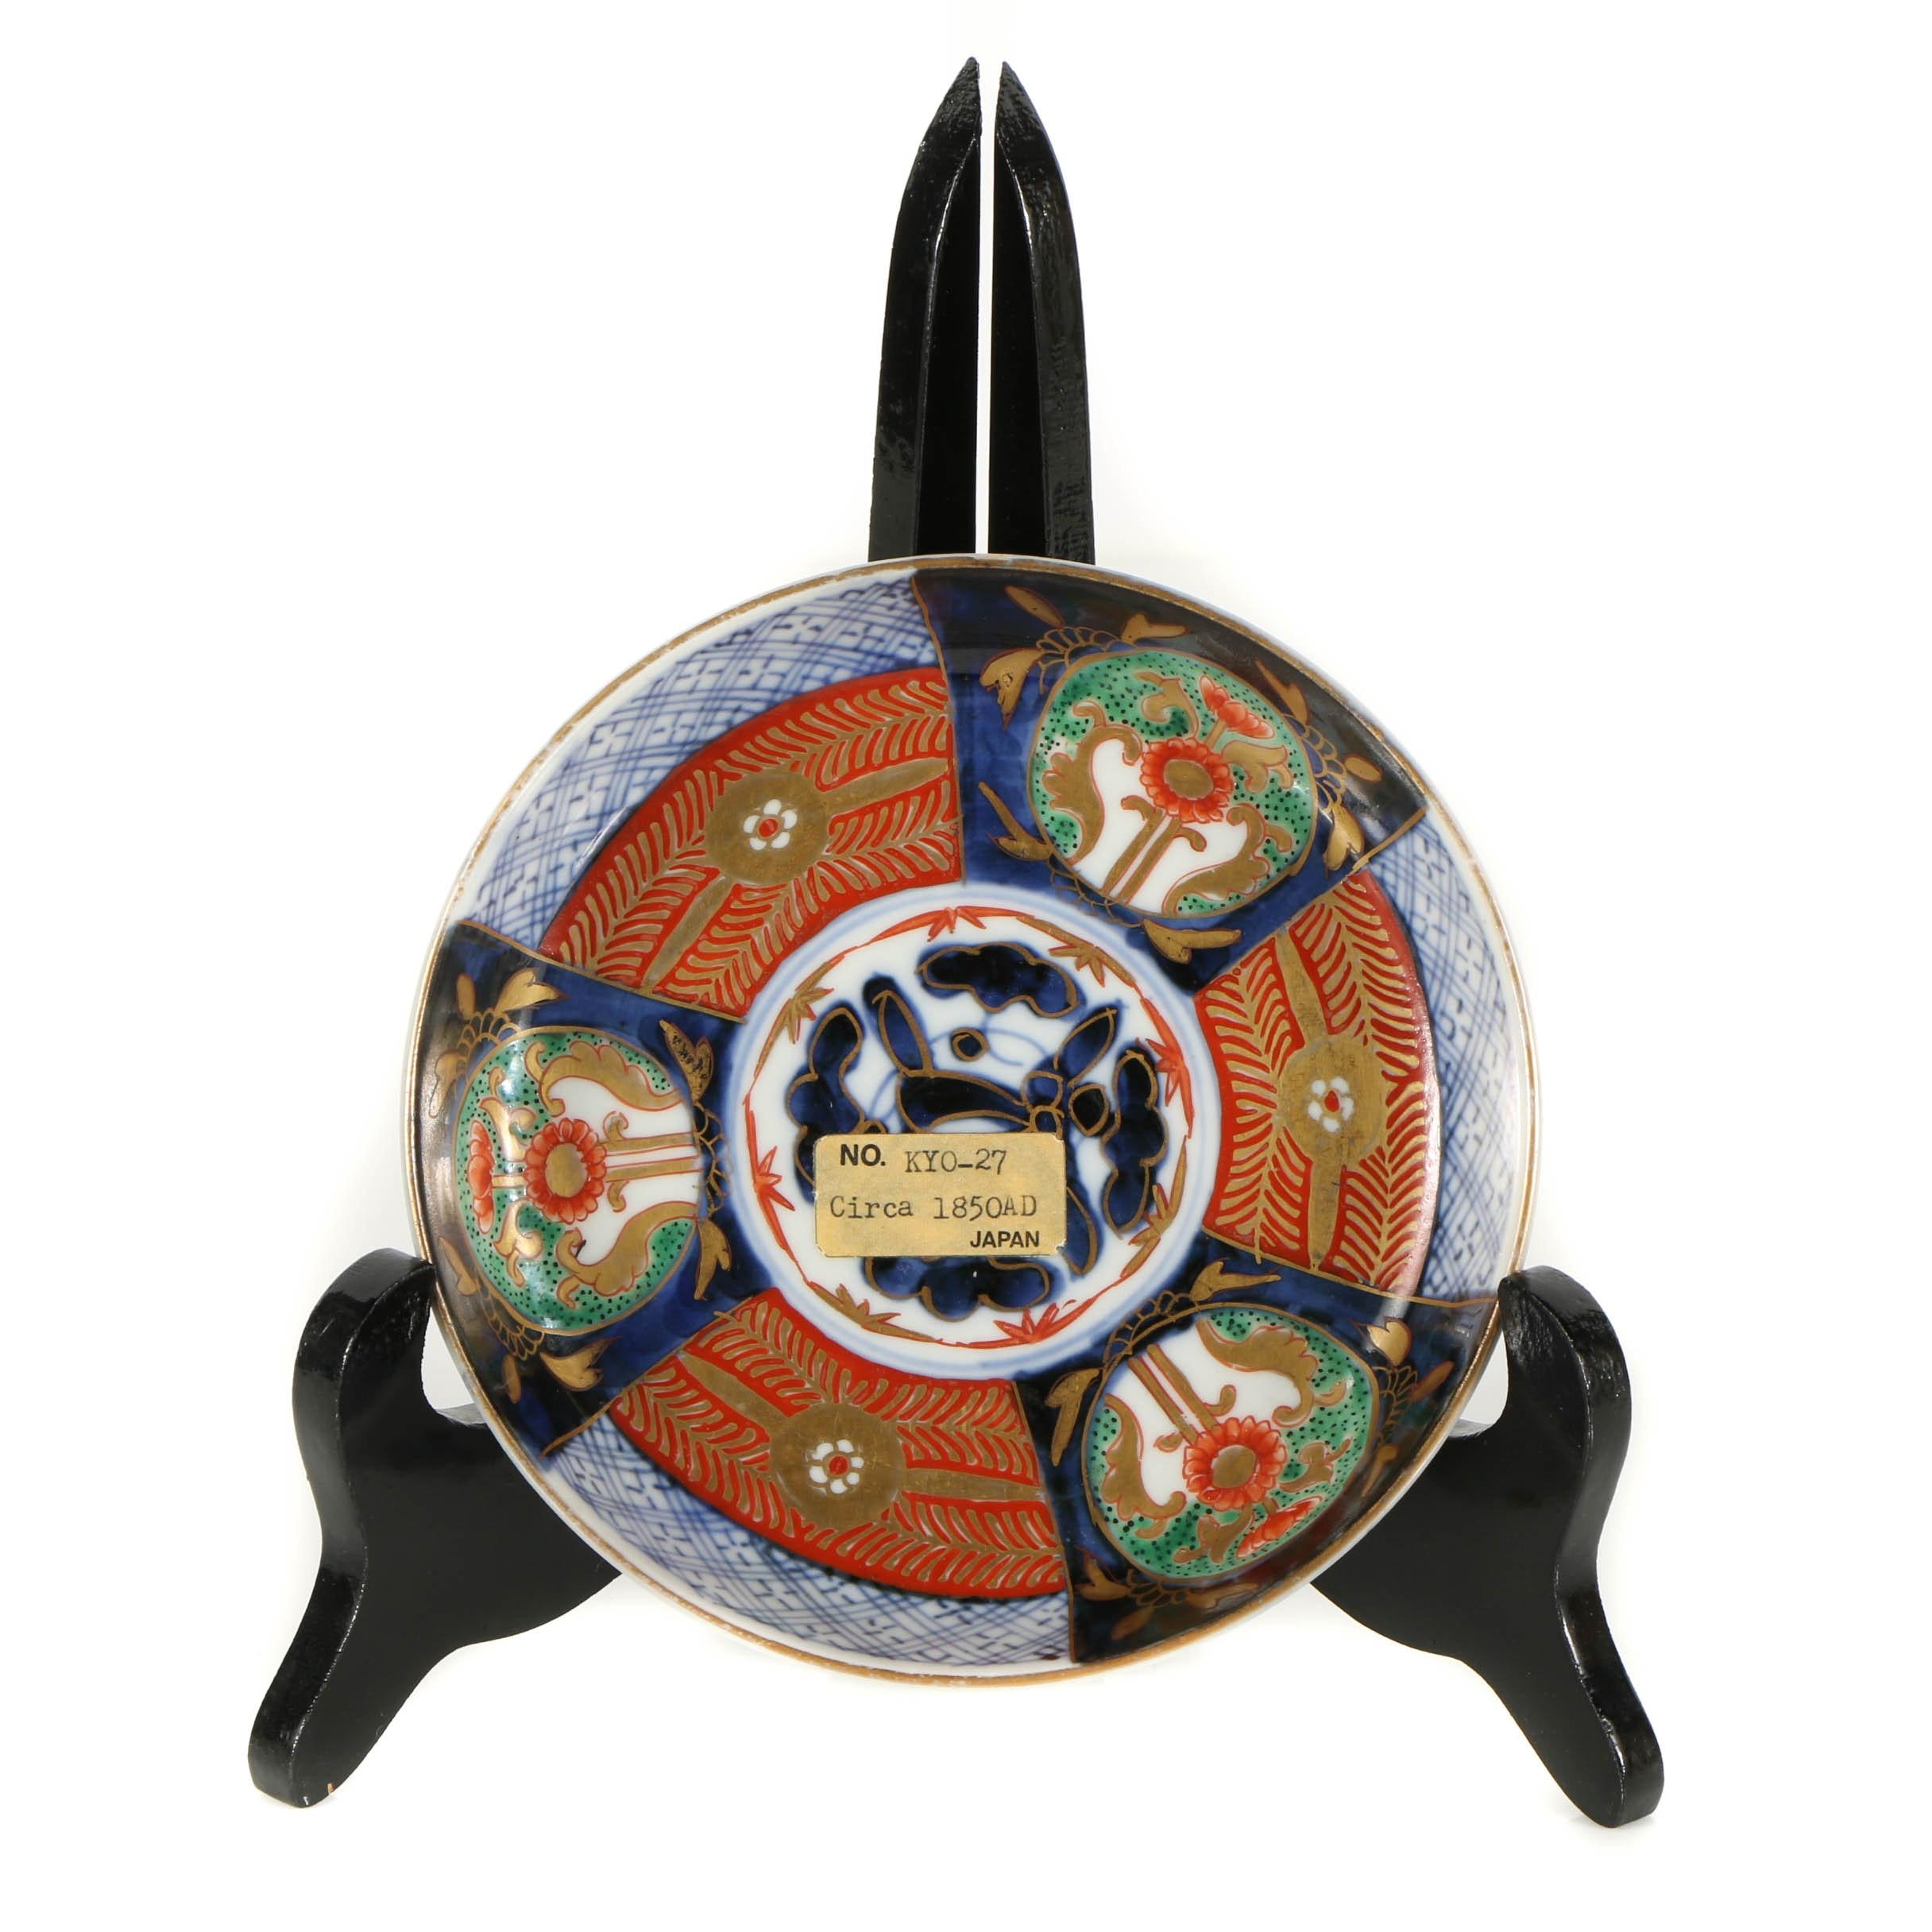 Japanese Imari Ware Porcelain Dish